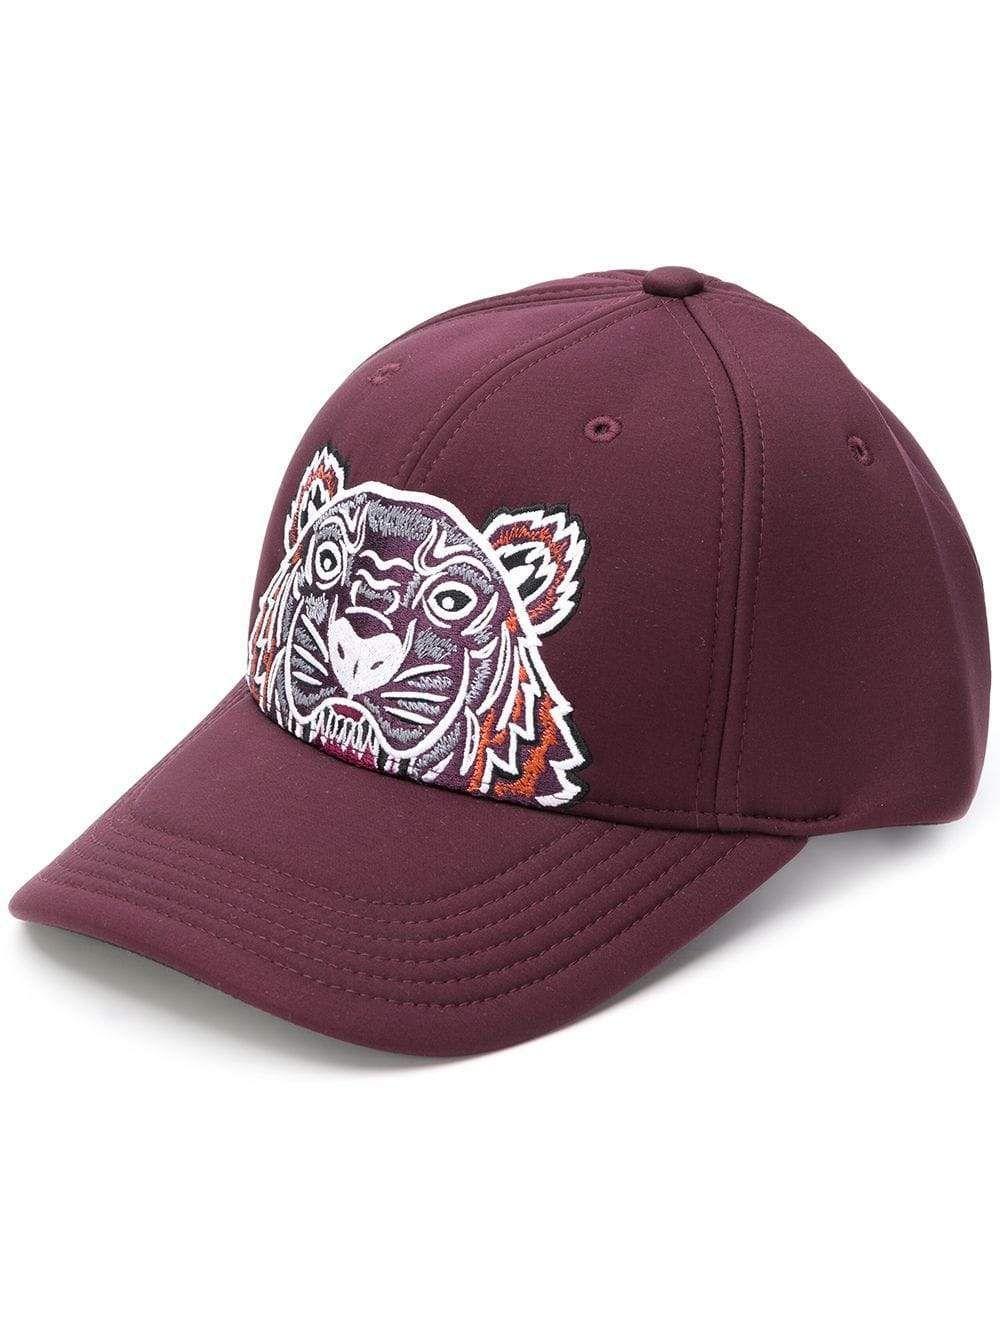 kenzo  cap  tiger  hat  burgundy  sporty  style  faschion  new www ... 12d2becbf16